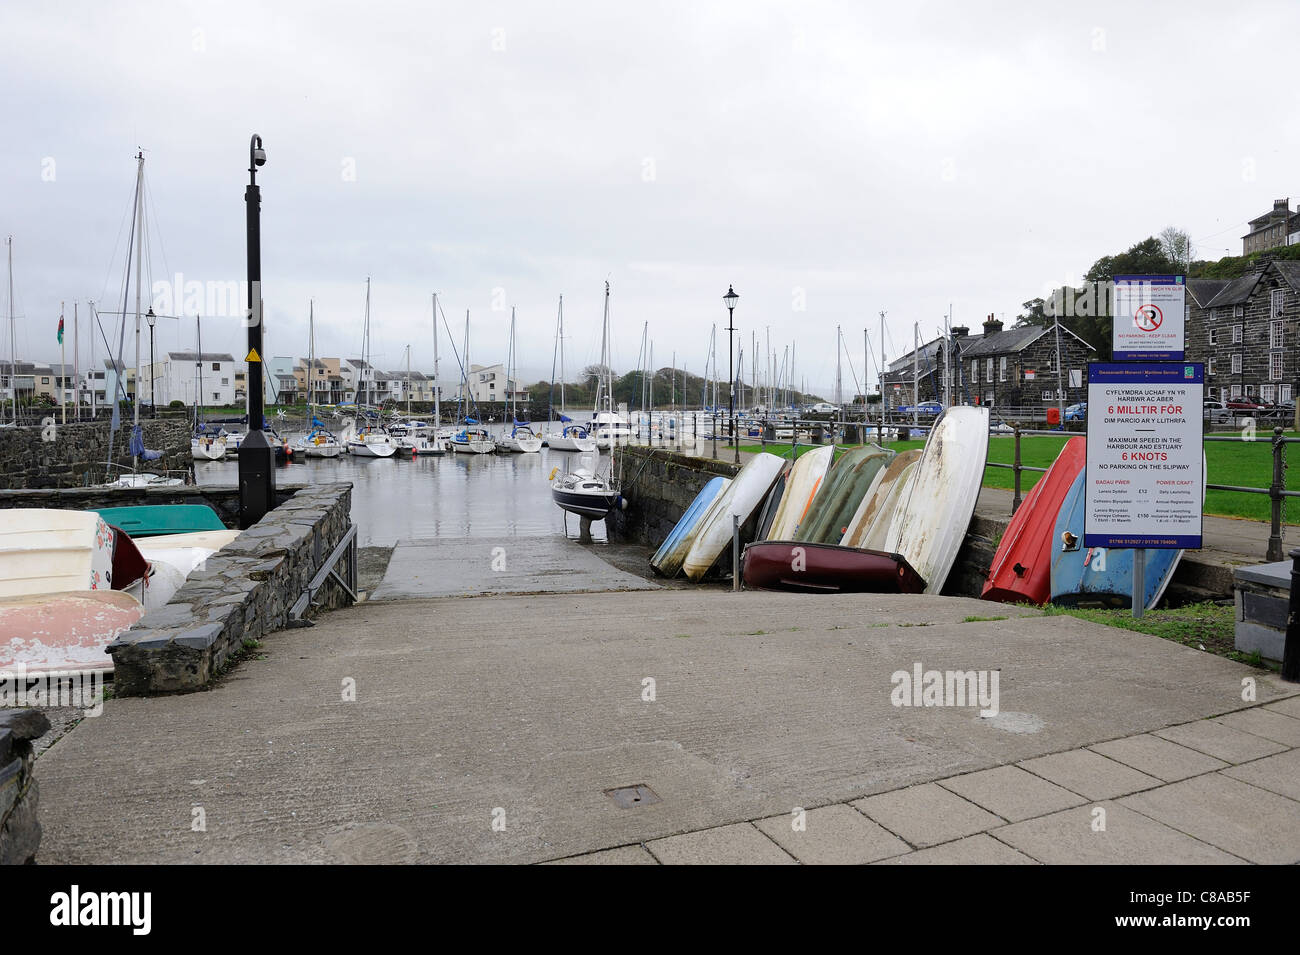 harbour towpath porthmadog gwynedd north wales uk - Stock Image